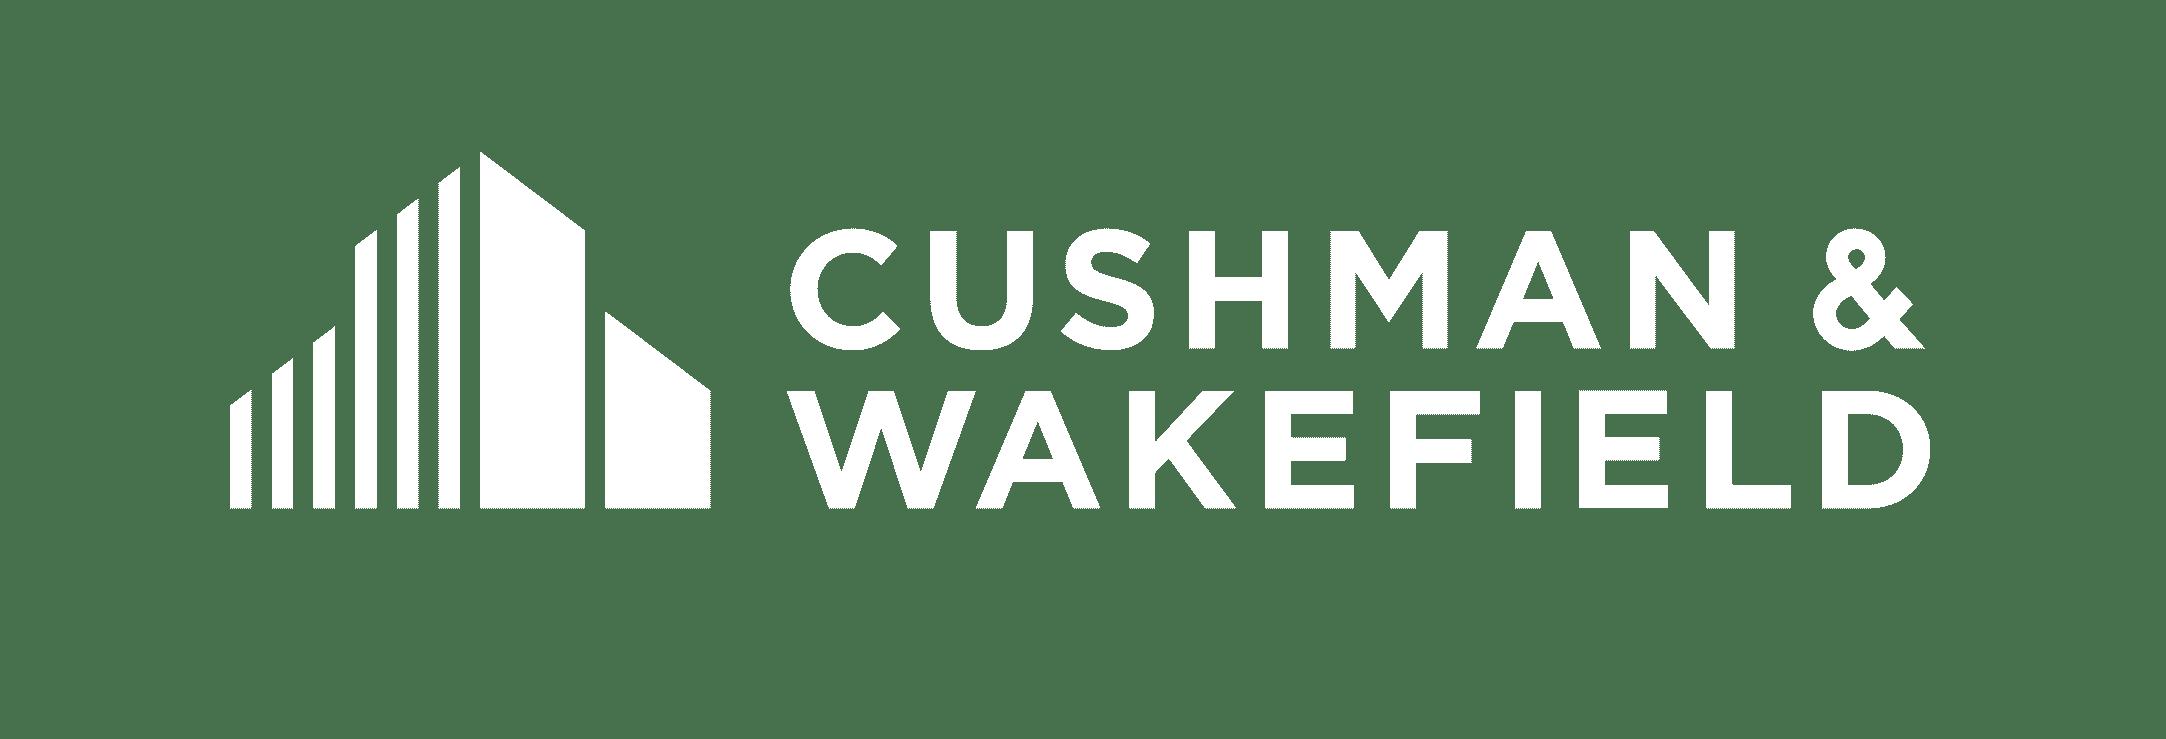 cushman-wakefield-logo-white.png